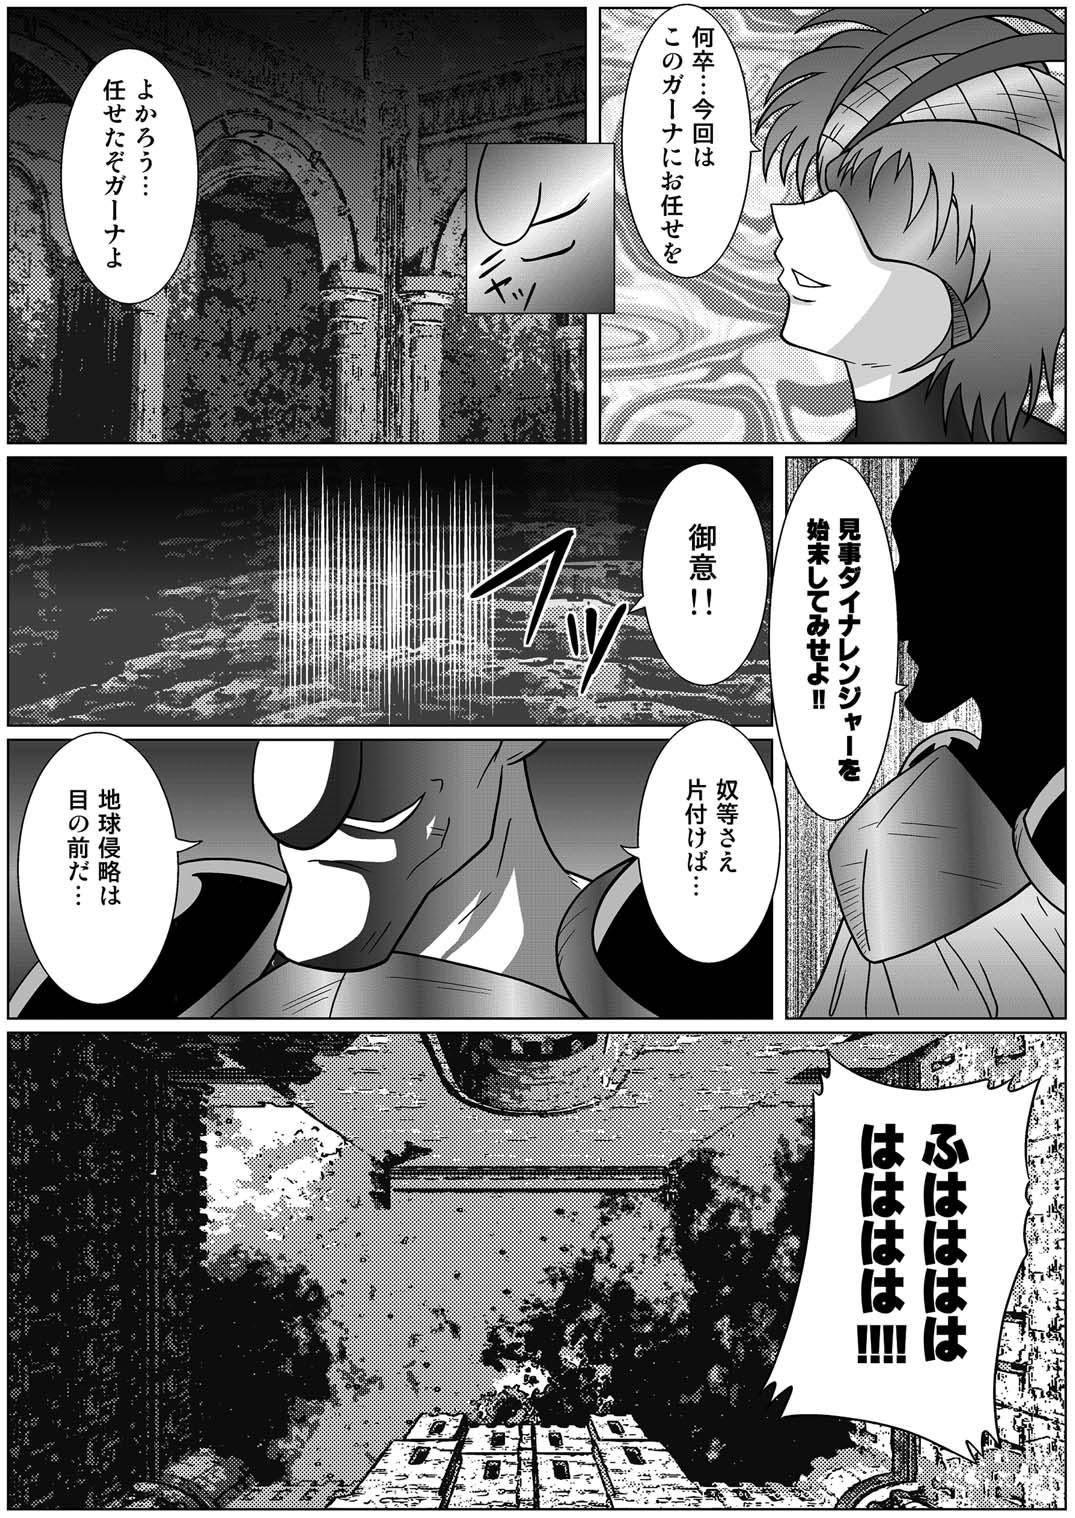 [Macxe's (monmon)] Tokubousentai Dinaranger ~Heroine Kairaku Sennou Keikaku~ Vol.01/02/03 (Renkaban) [Digital] 6